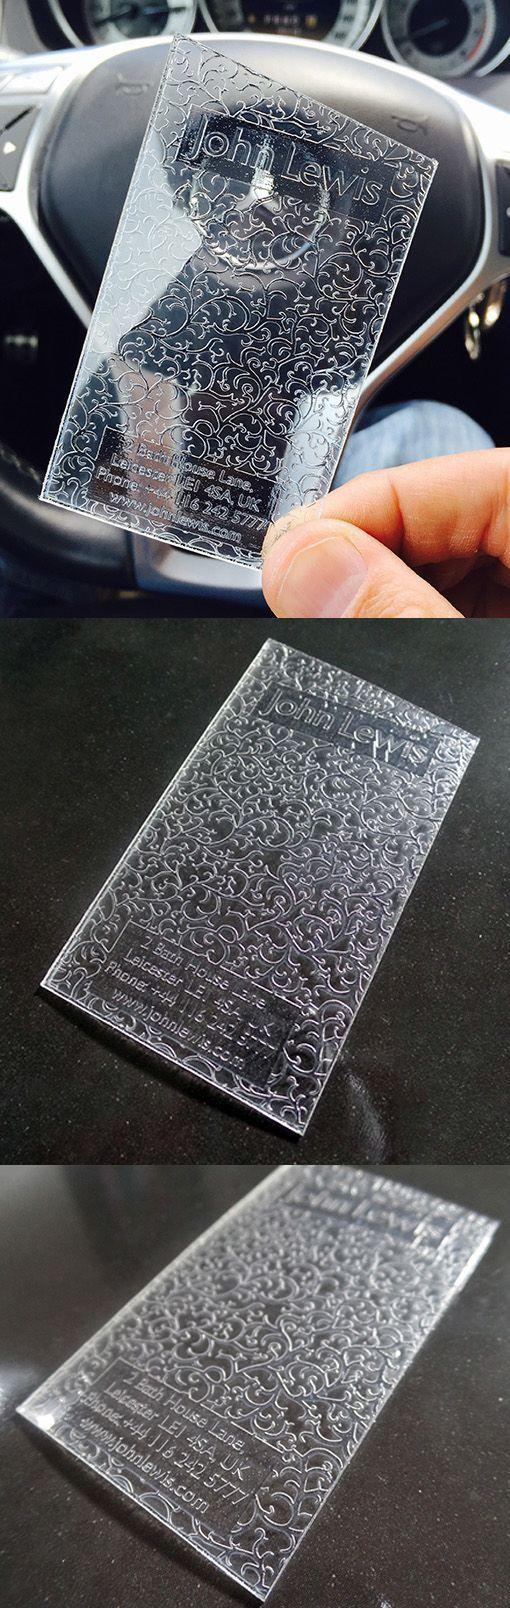 277 Best Business Card Images On Pinterest Business Card Design